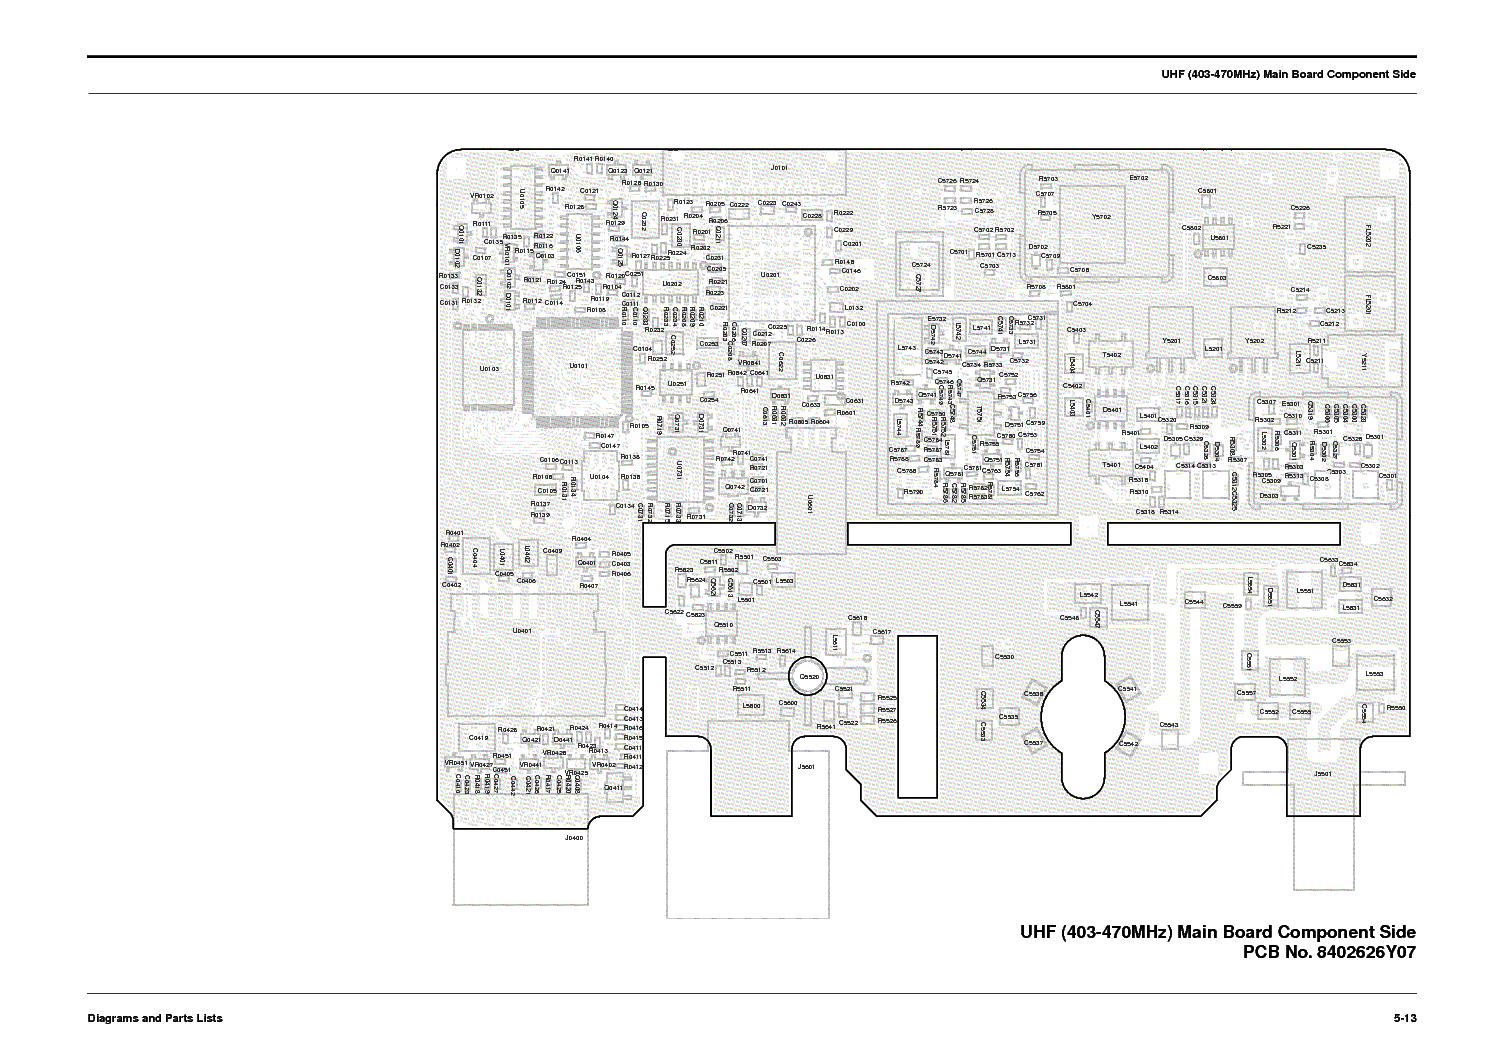 motorola droid manual pdf download